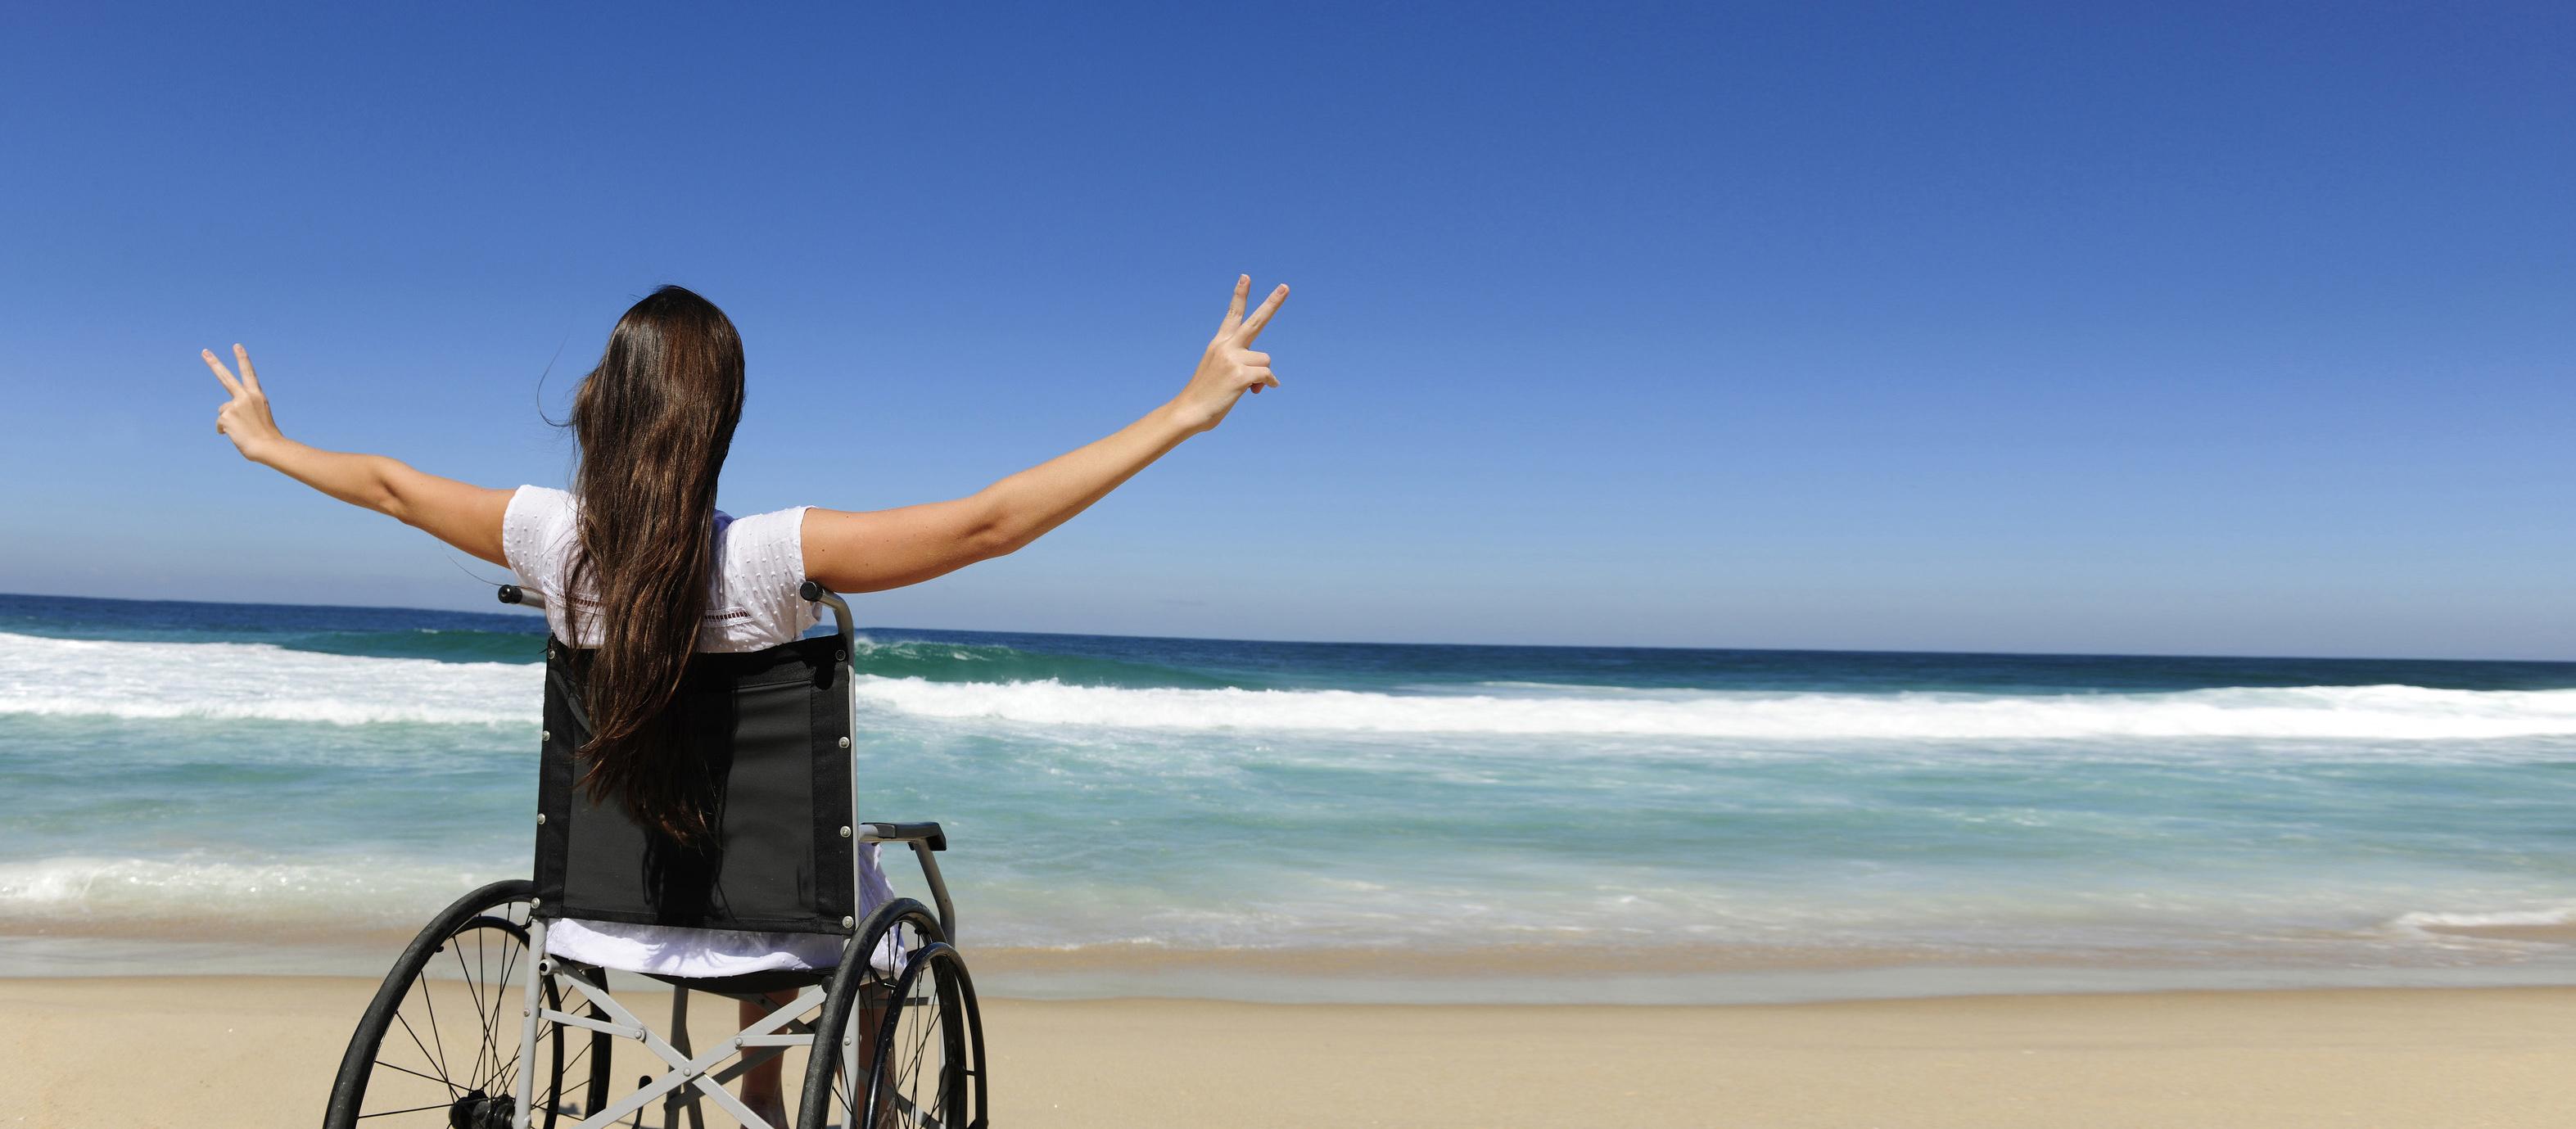 mm66-slide1-fauteuil-roulant